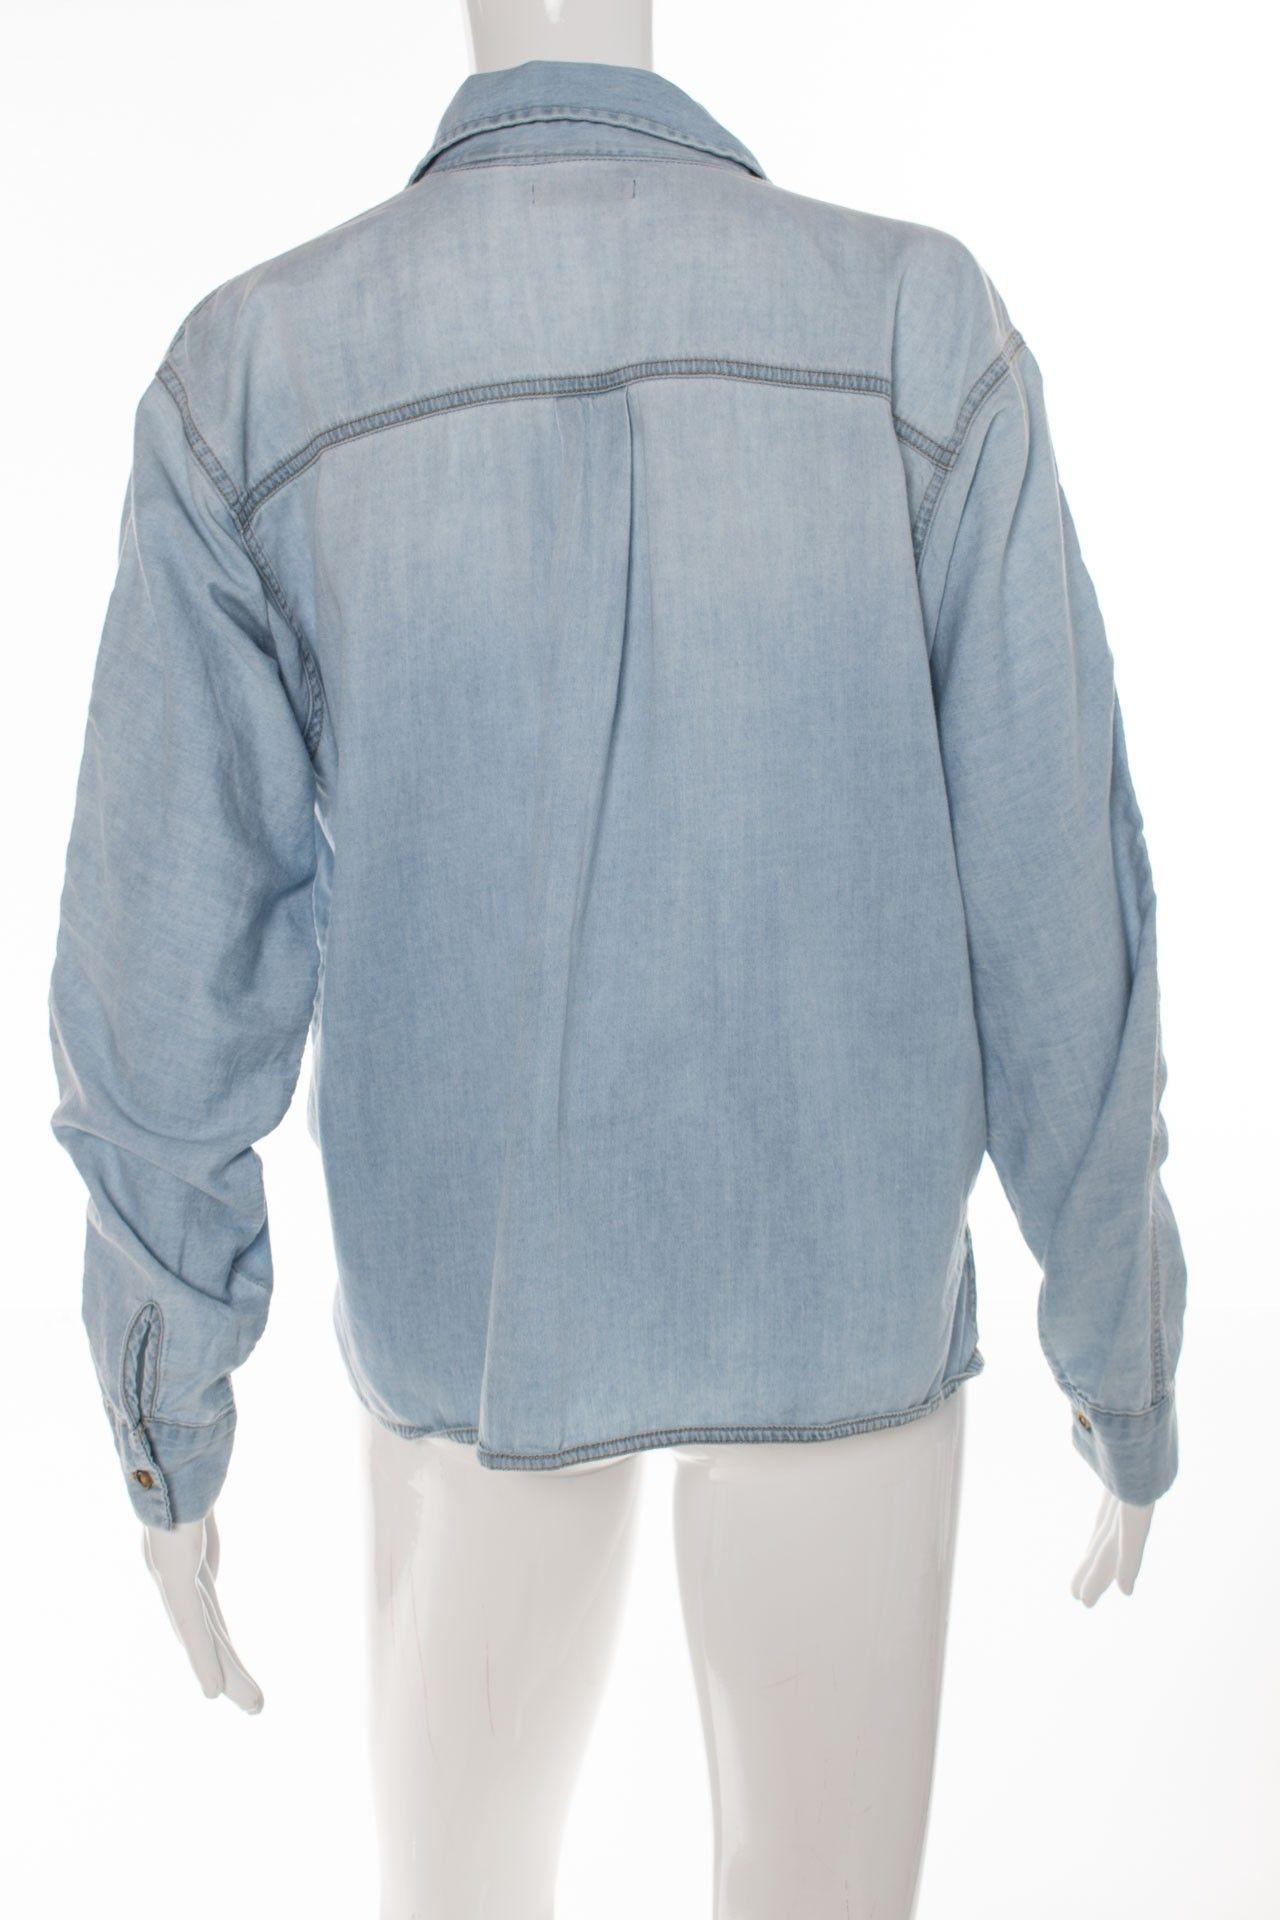 Topshop - Camisa Jeans - Foto 2